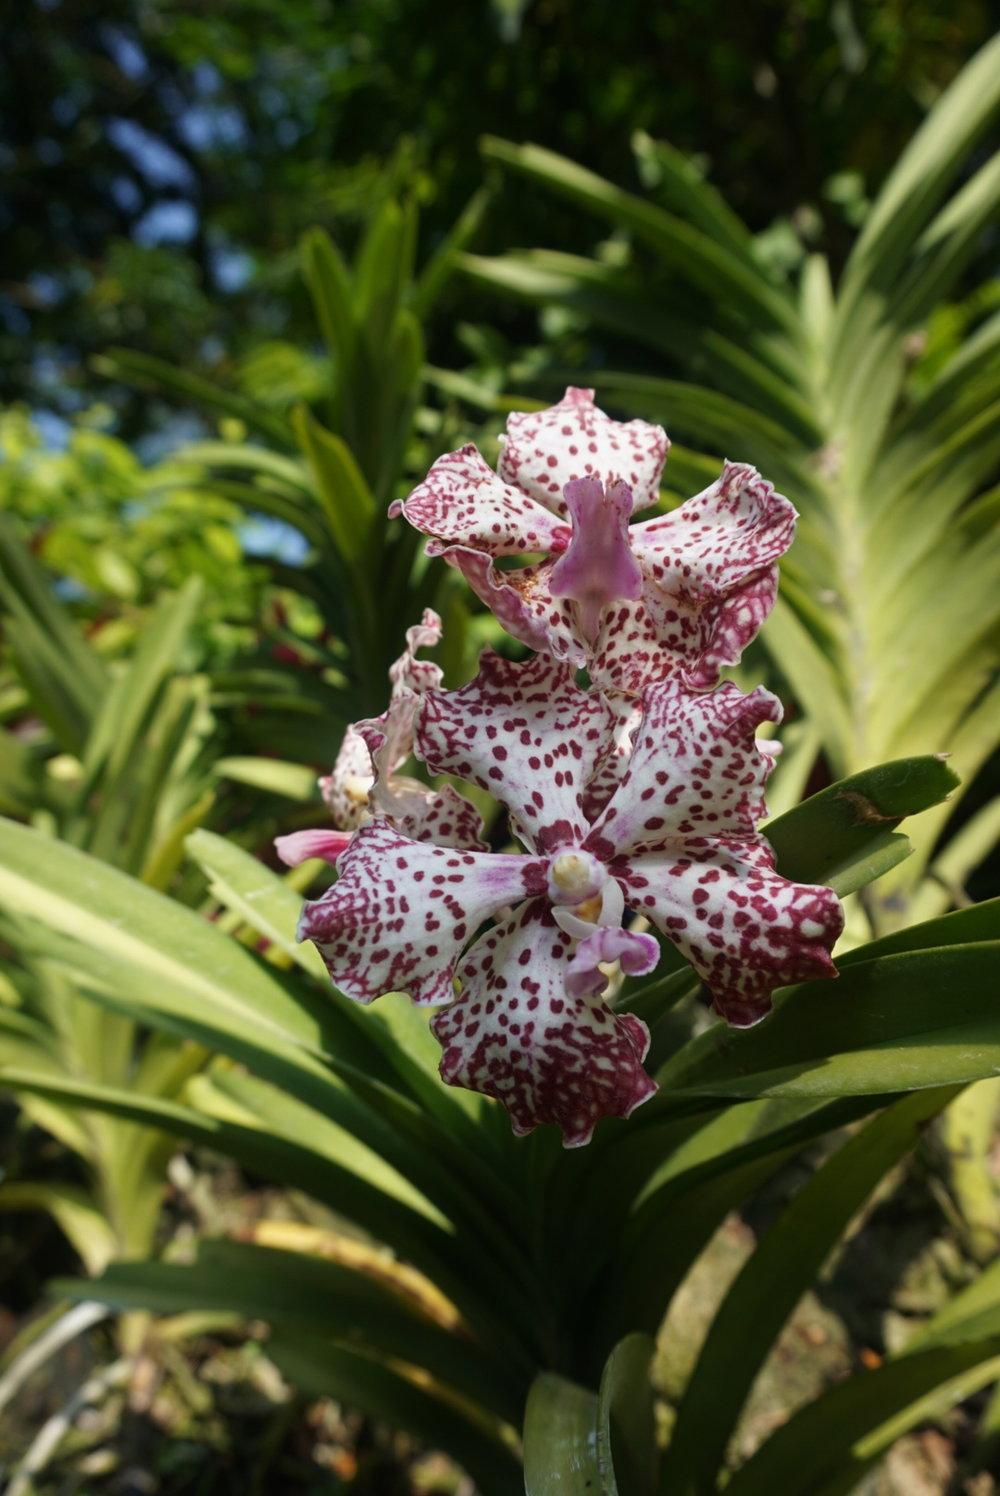 spottedorchid.jpg